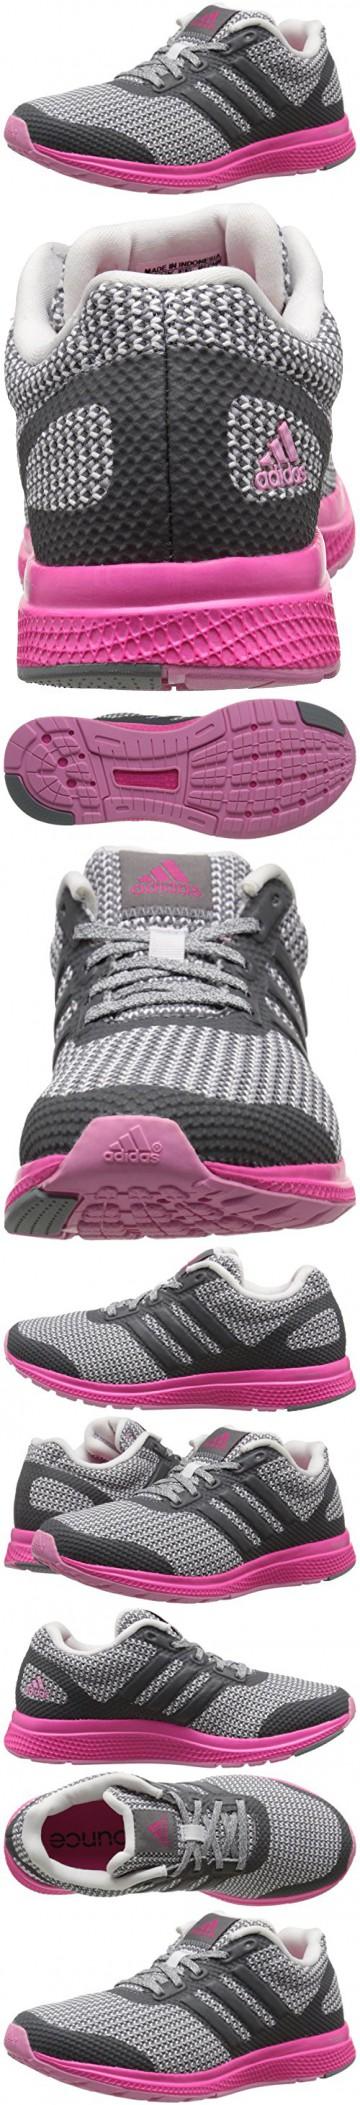 adidas performance donne mana rimbalzare scarpa da corsa, vista grigio / bianco